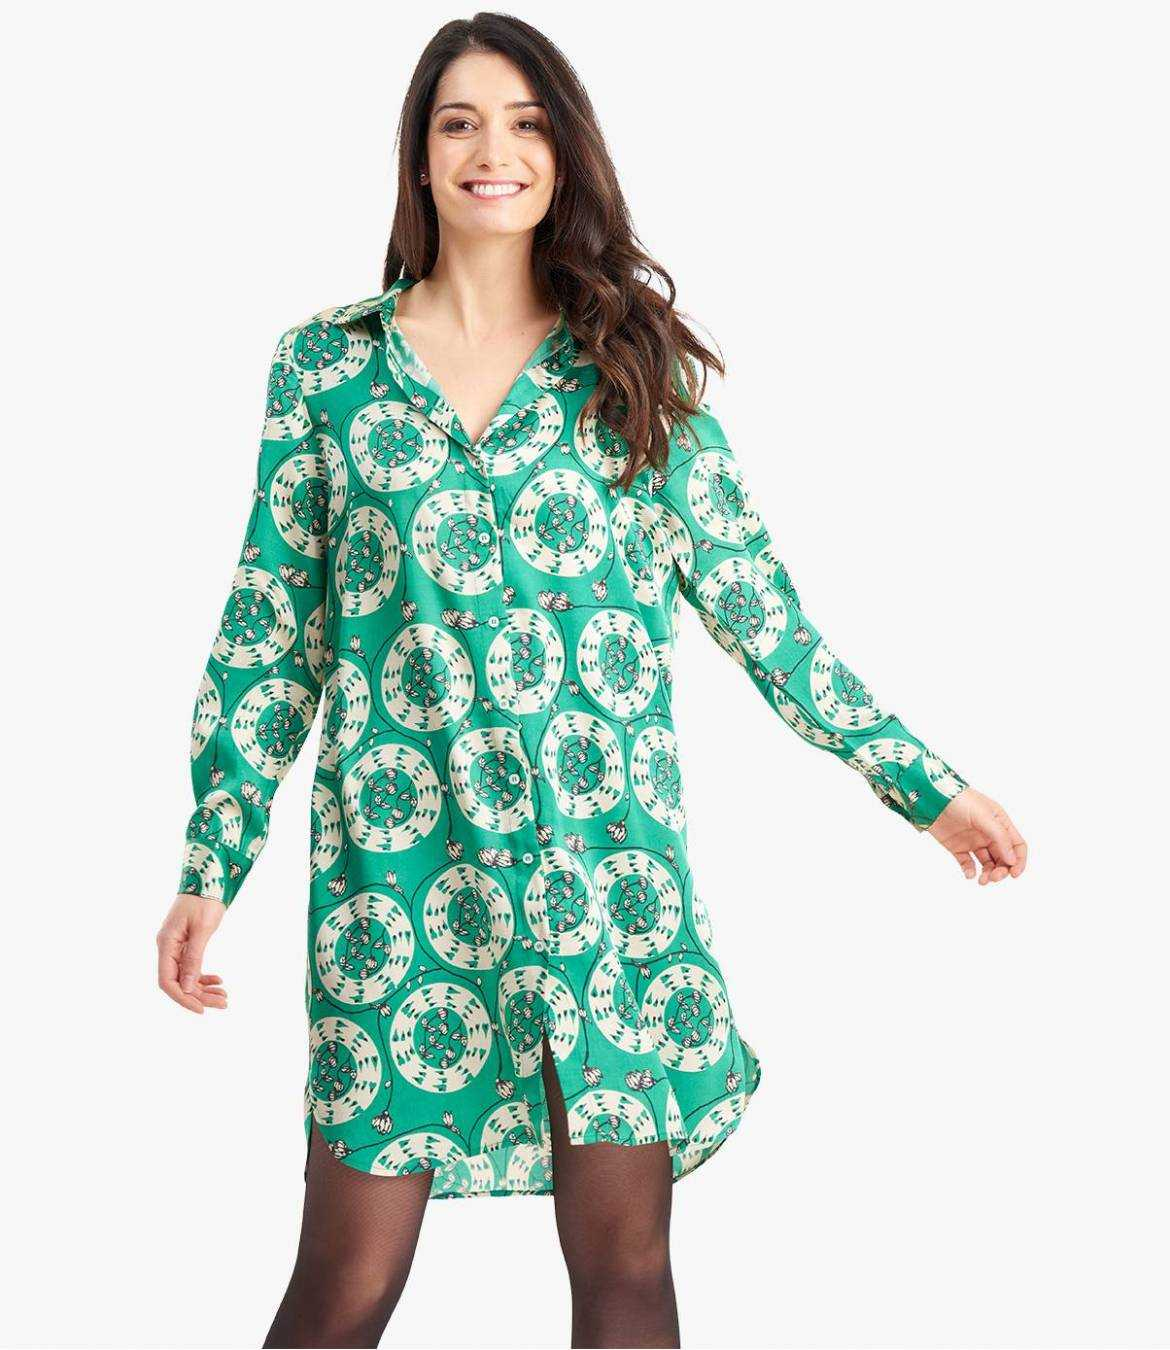 KAIA EVE Robe en Modal satin pour Femme - 12